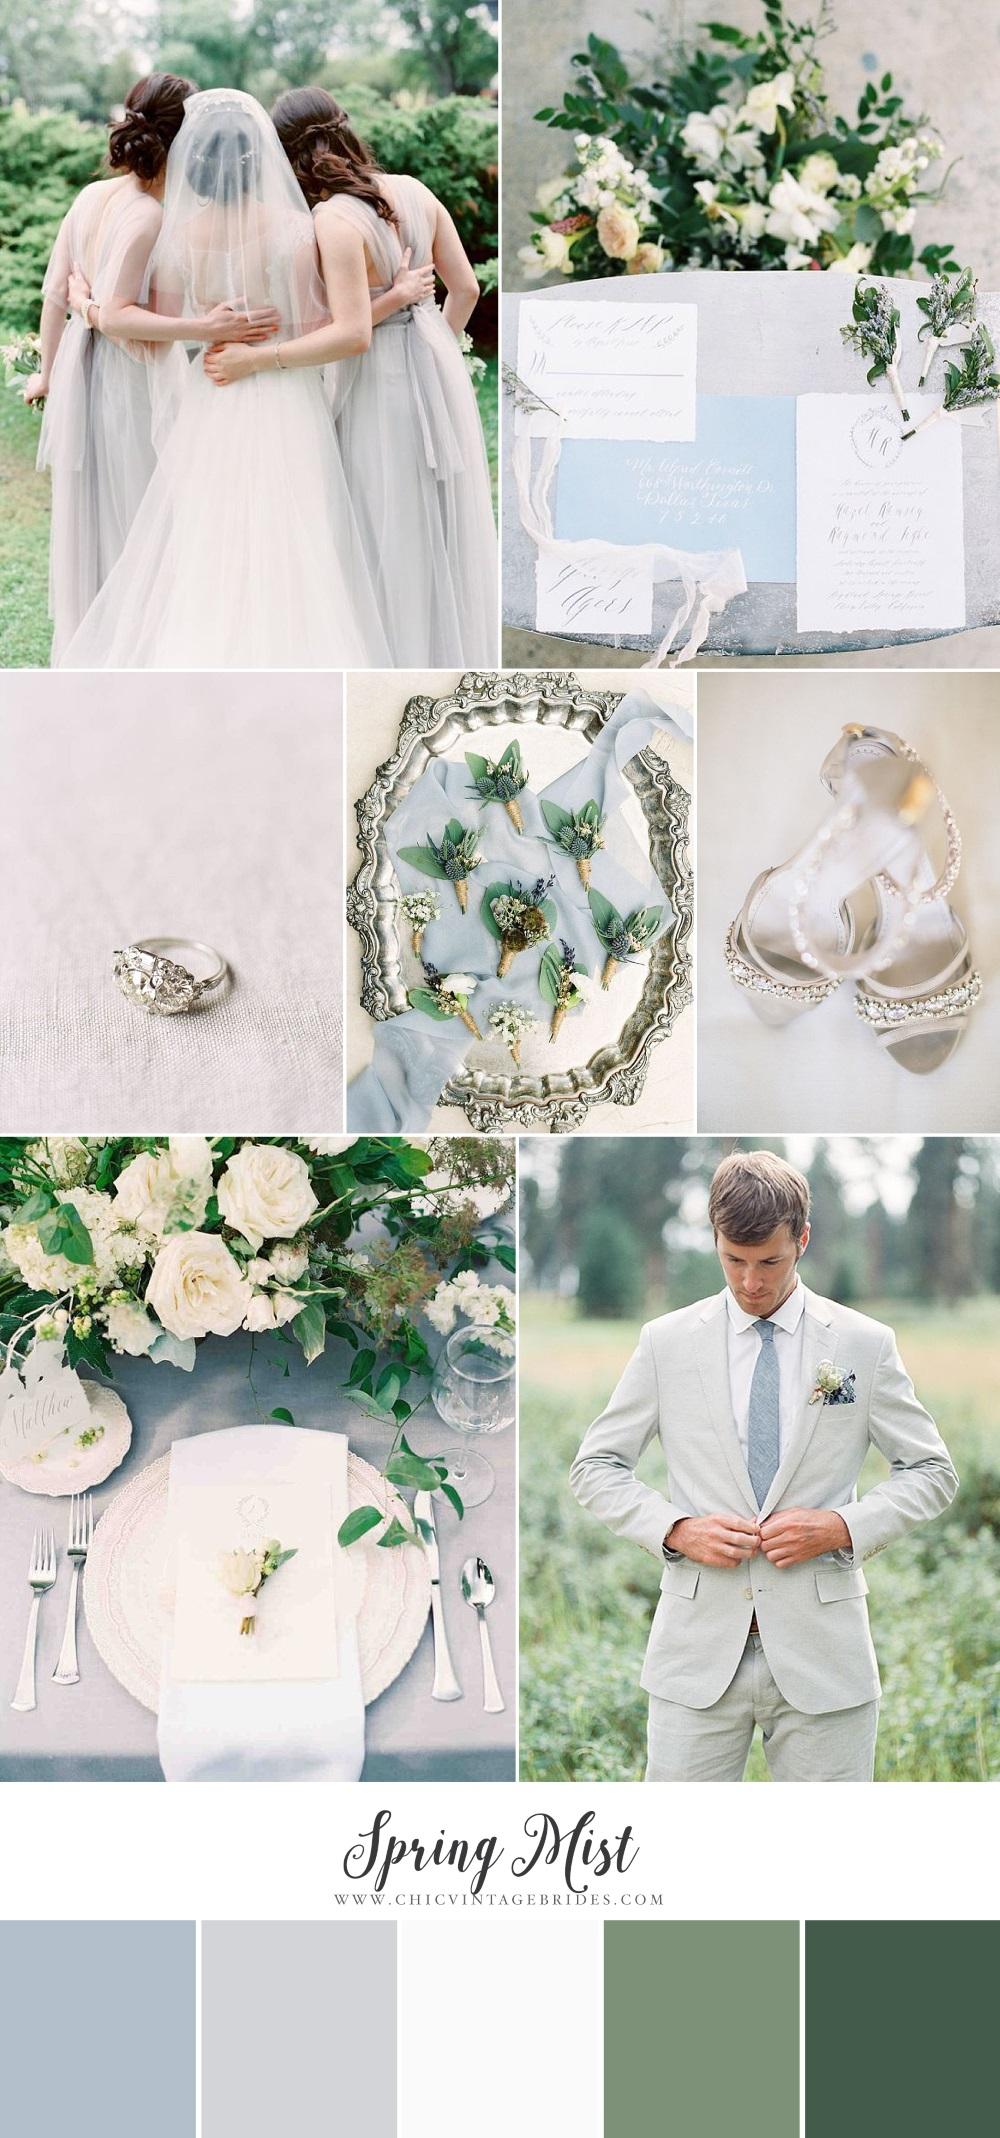 Spring Mist - Blue & Grey Wedding Inspiration Board